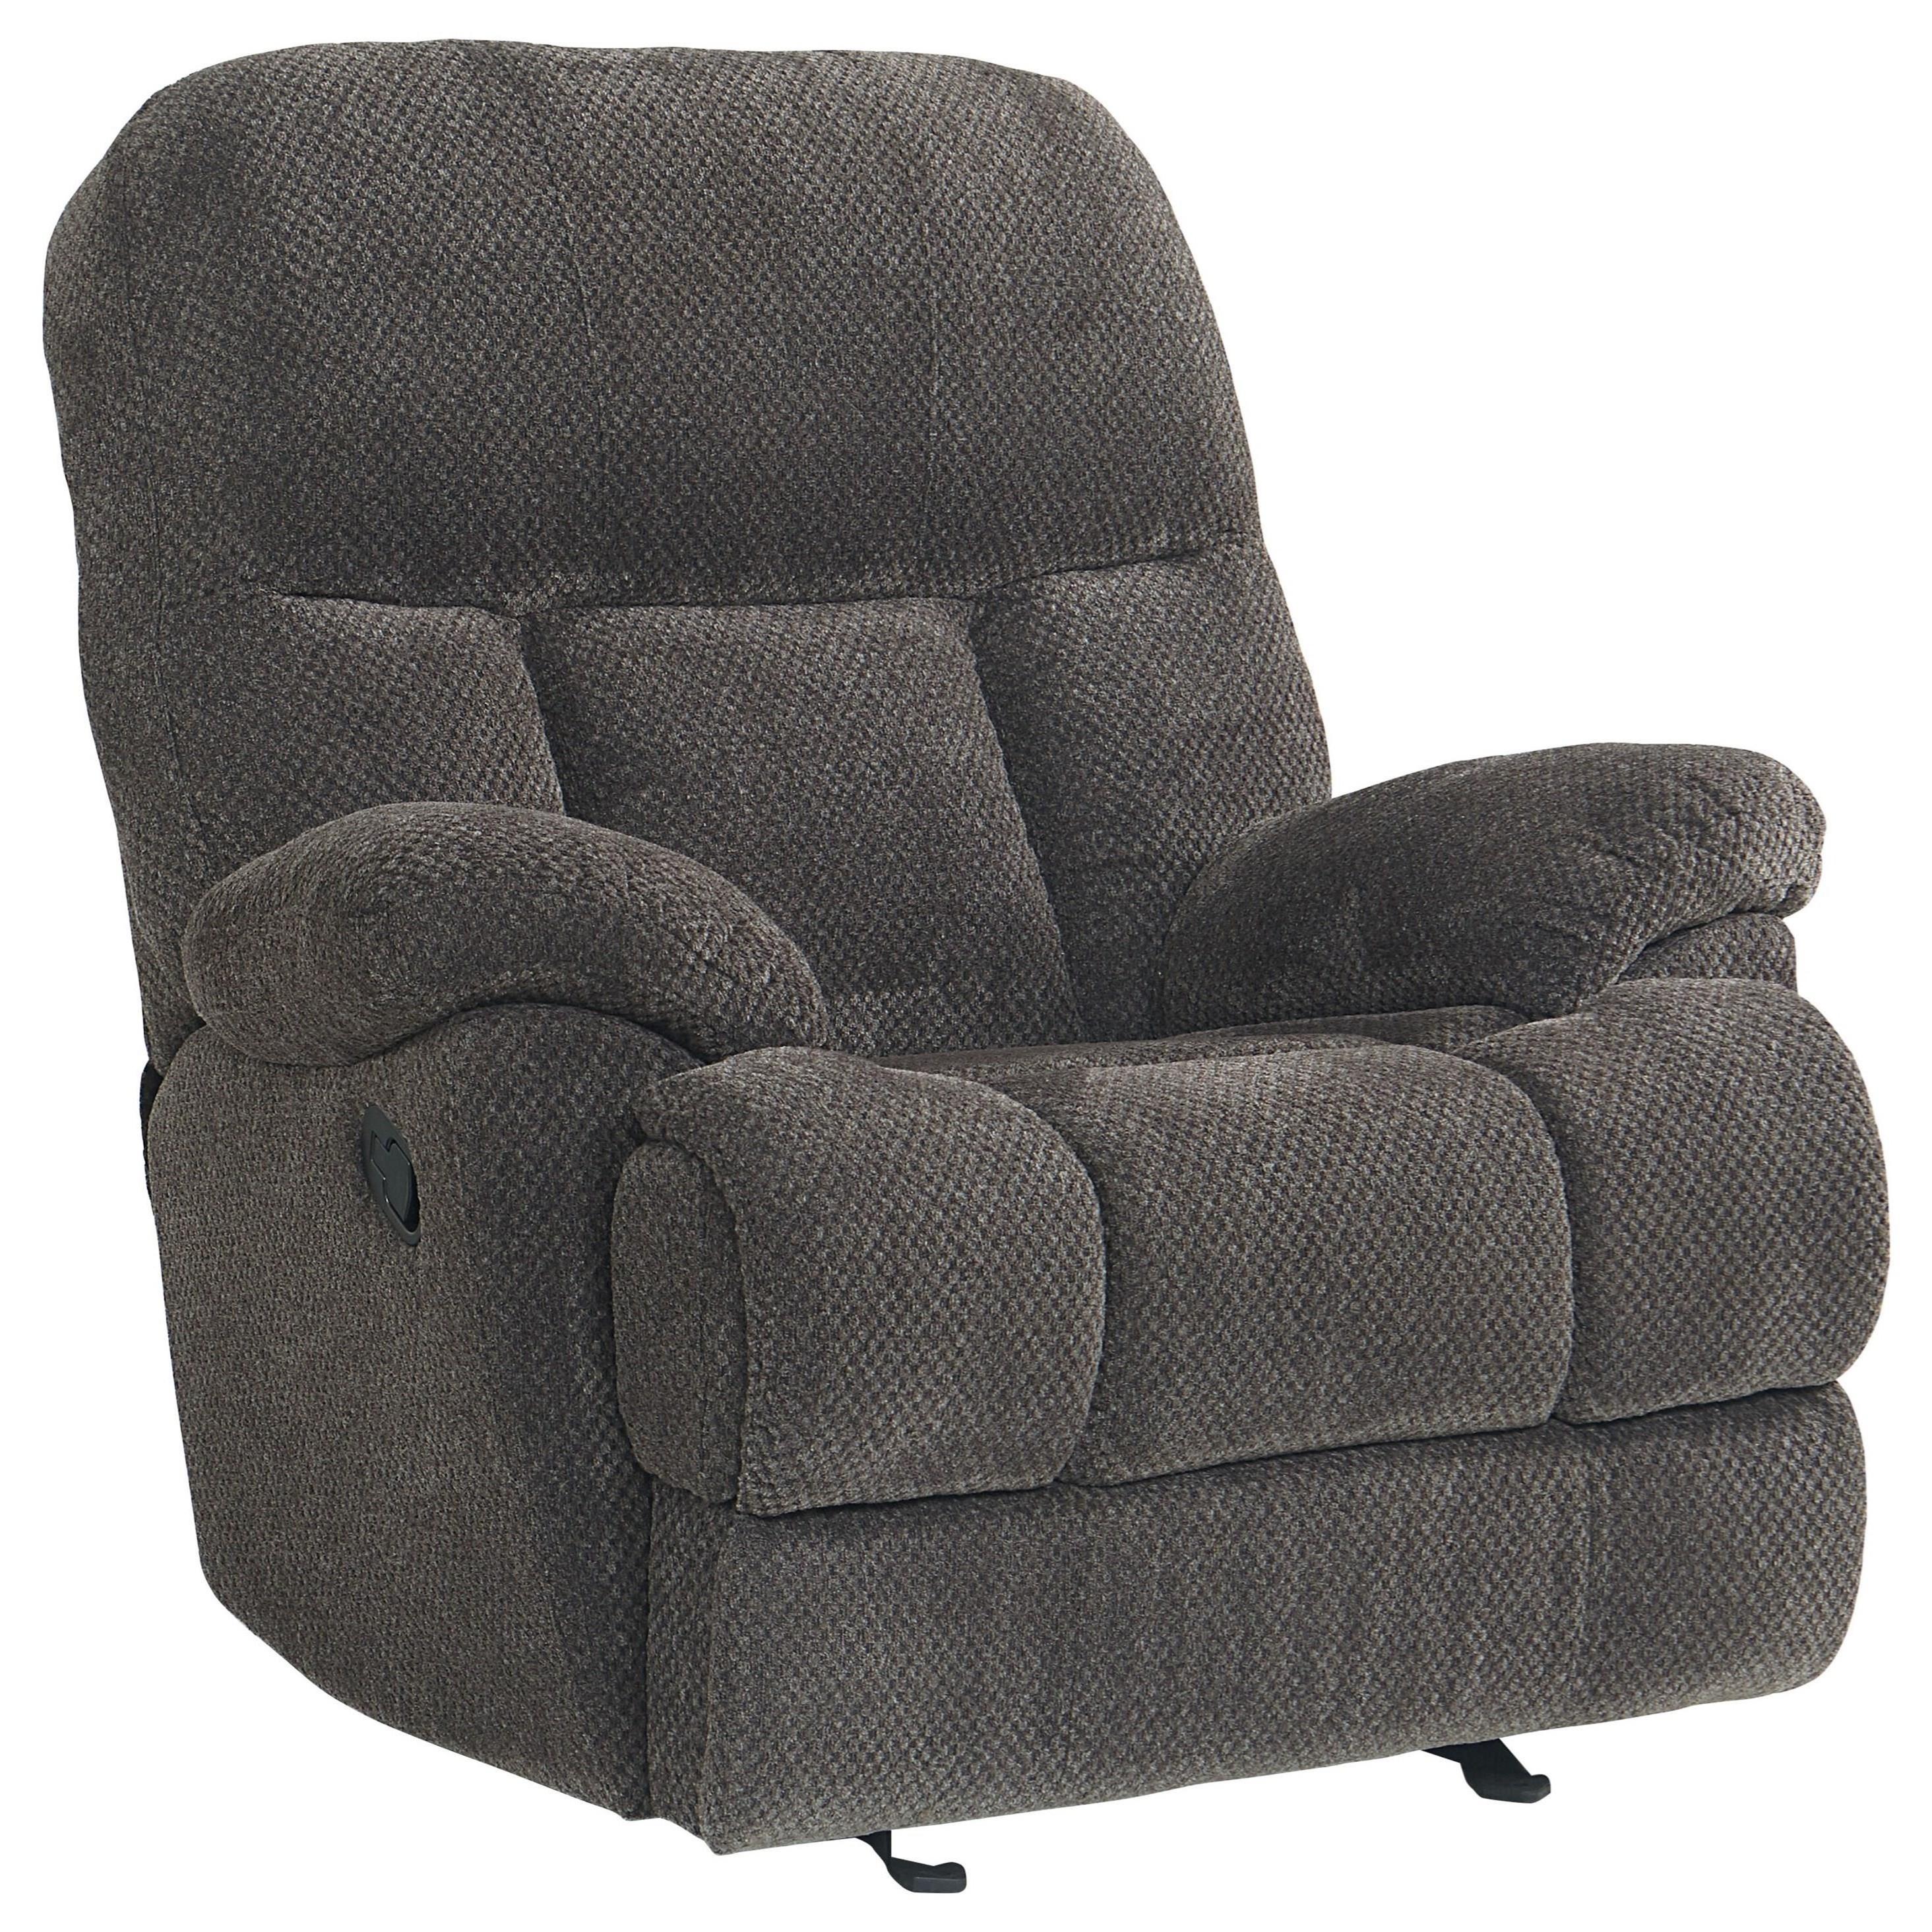 Standard Furniture Harmon Recliner - Item Number: 4125955